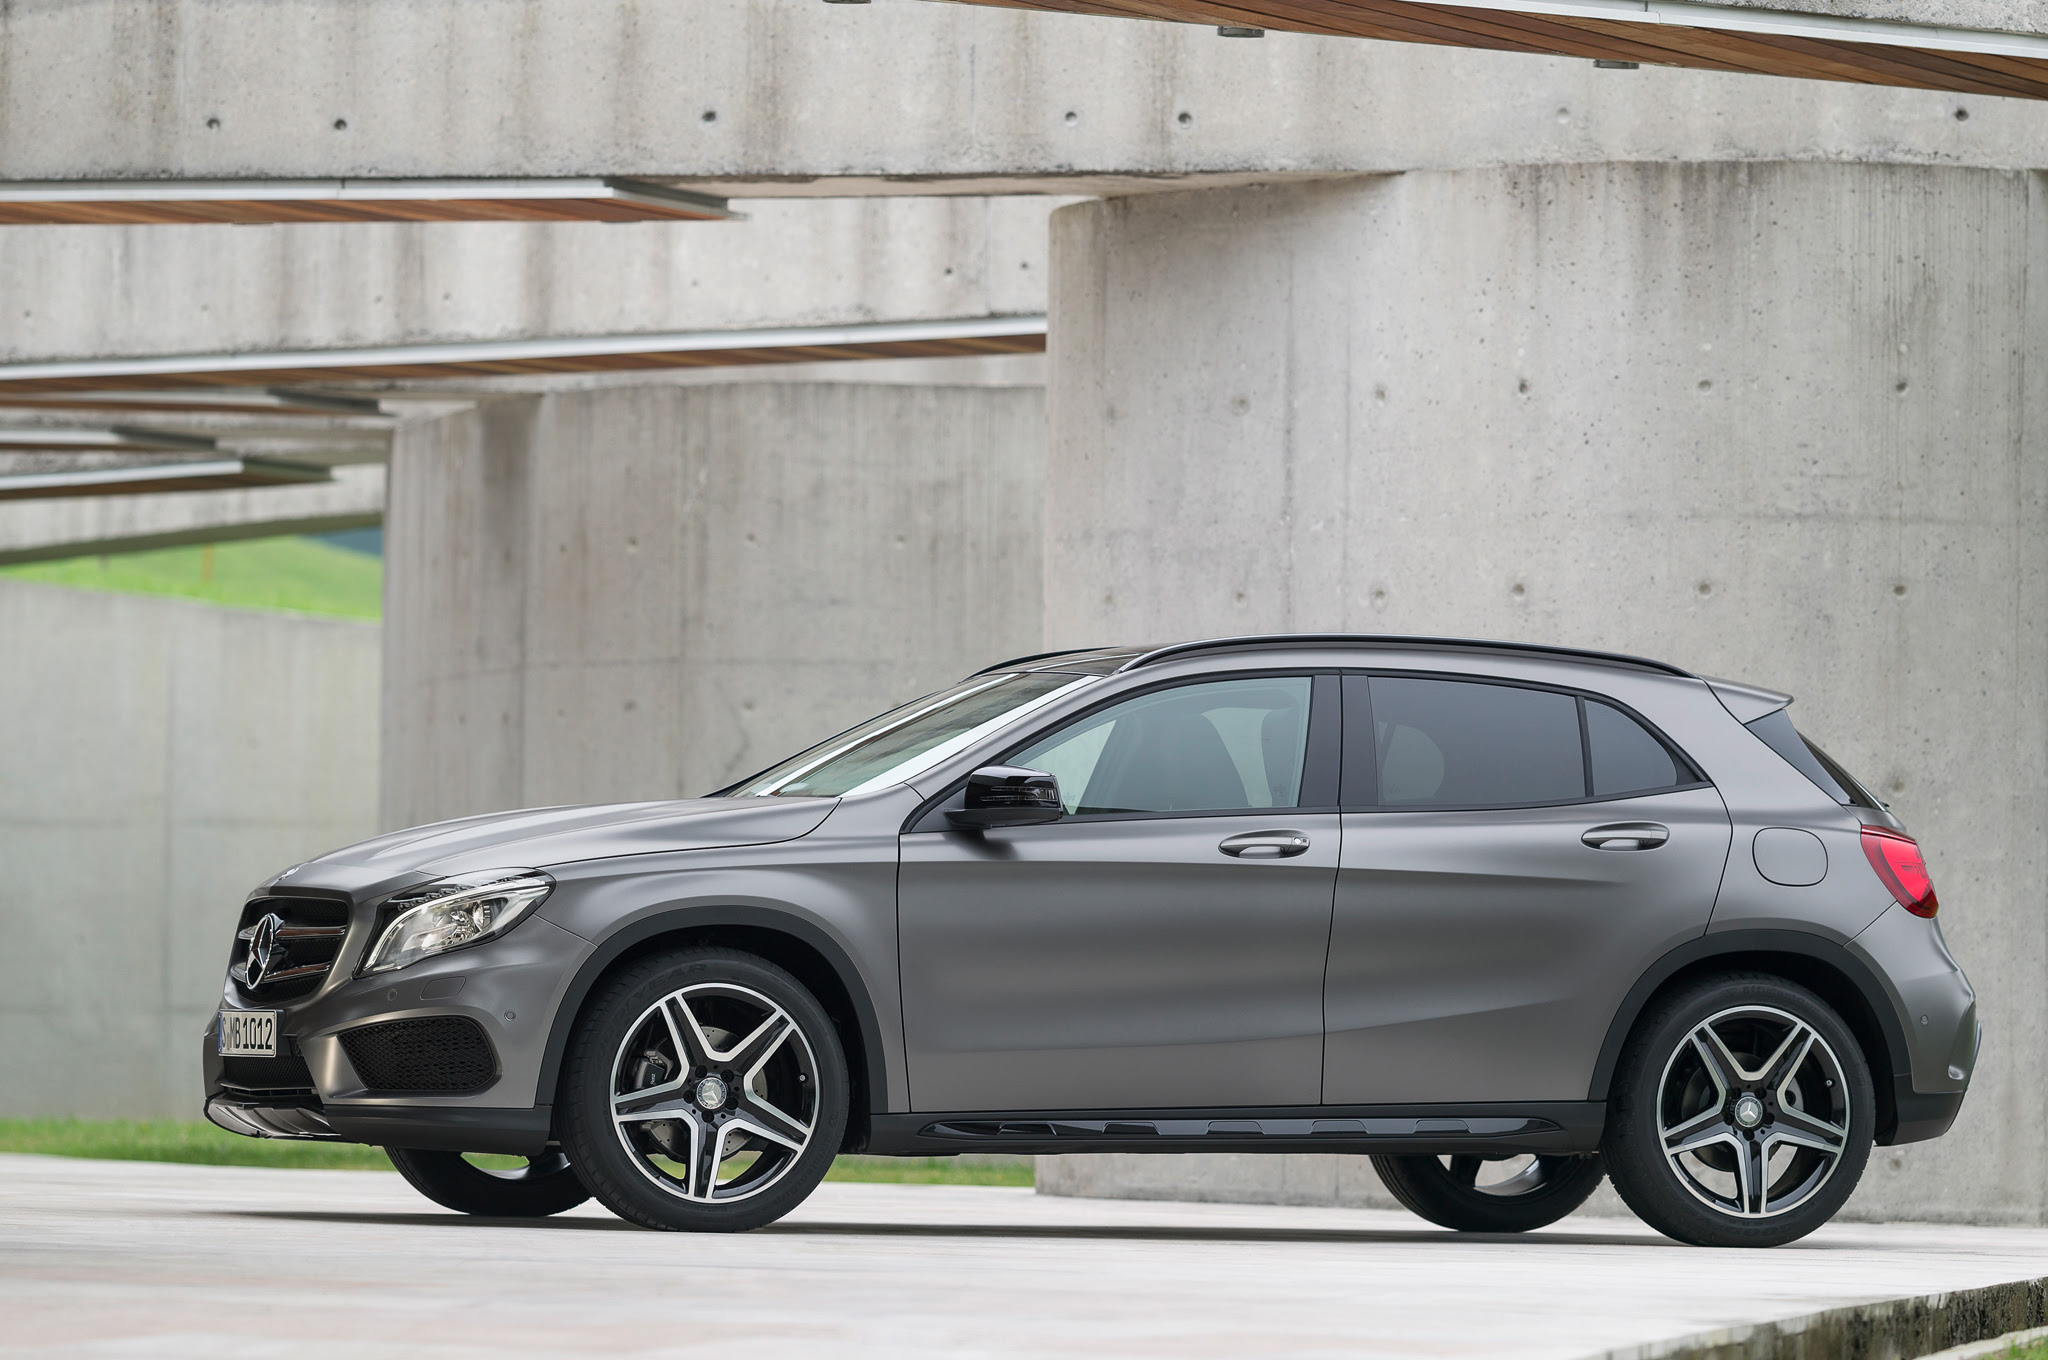 2015 Mercedes-Benz GLA 250 4MATIC Design - Carspoon.com